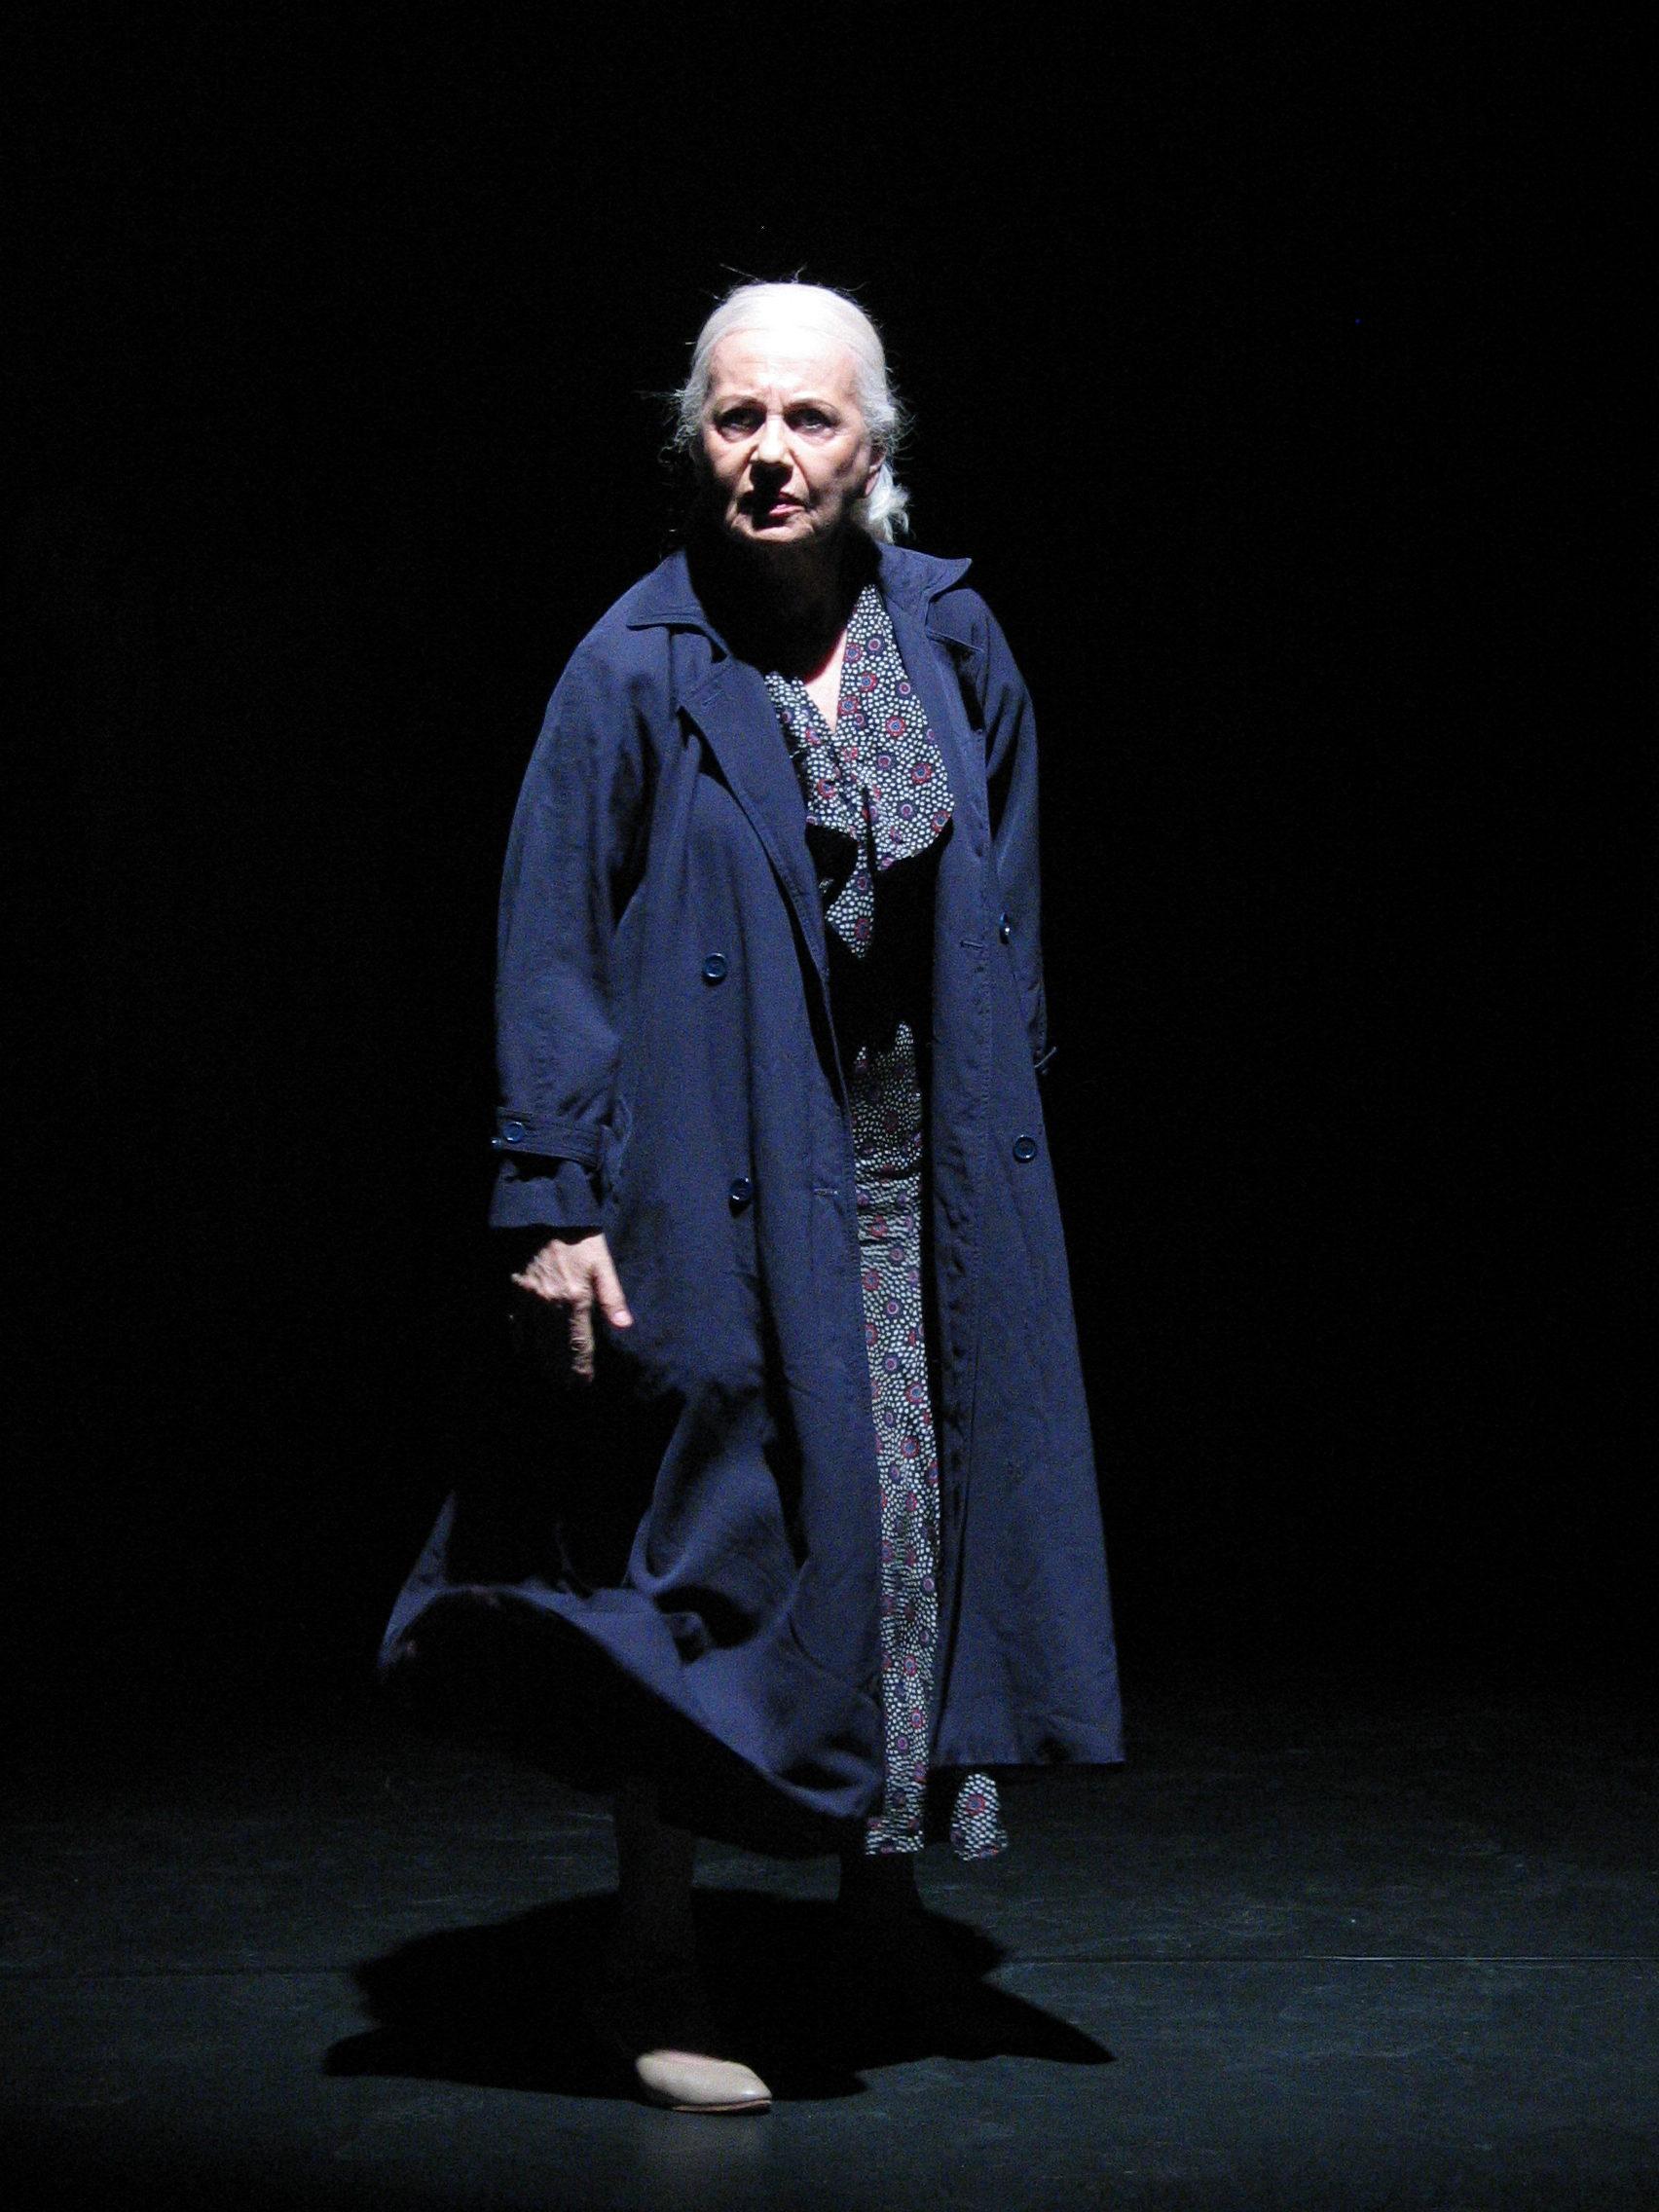 Loredana Cannata,Saaphyri Windsor Adult gallery Eve Southern,Hayley Atwell (born 1982 (dual British and American citizenship)